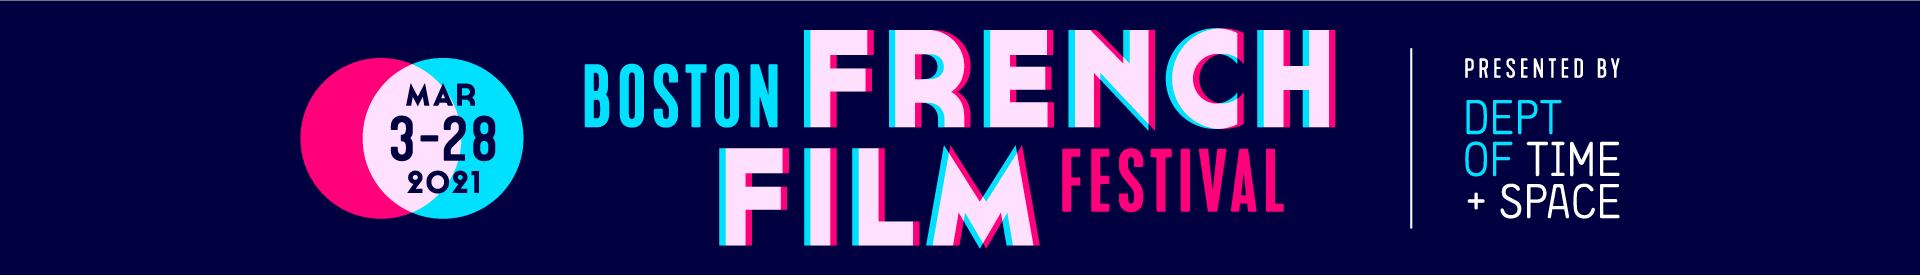 Boston French Film Festival